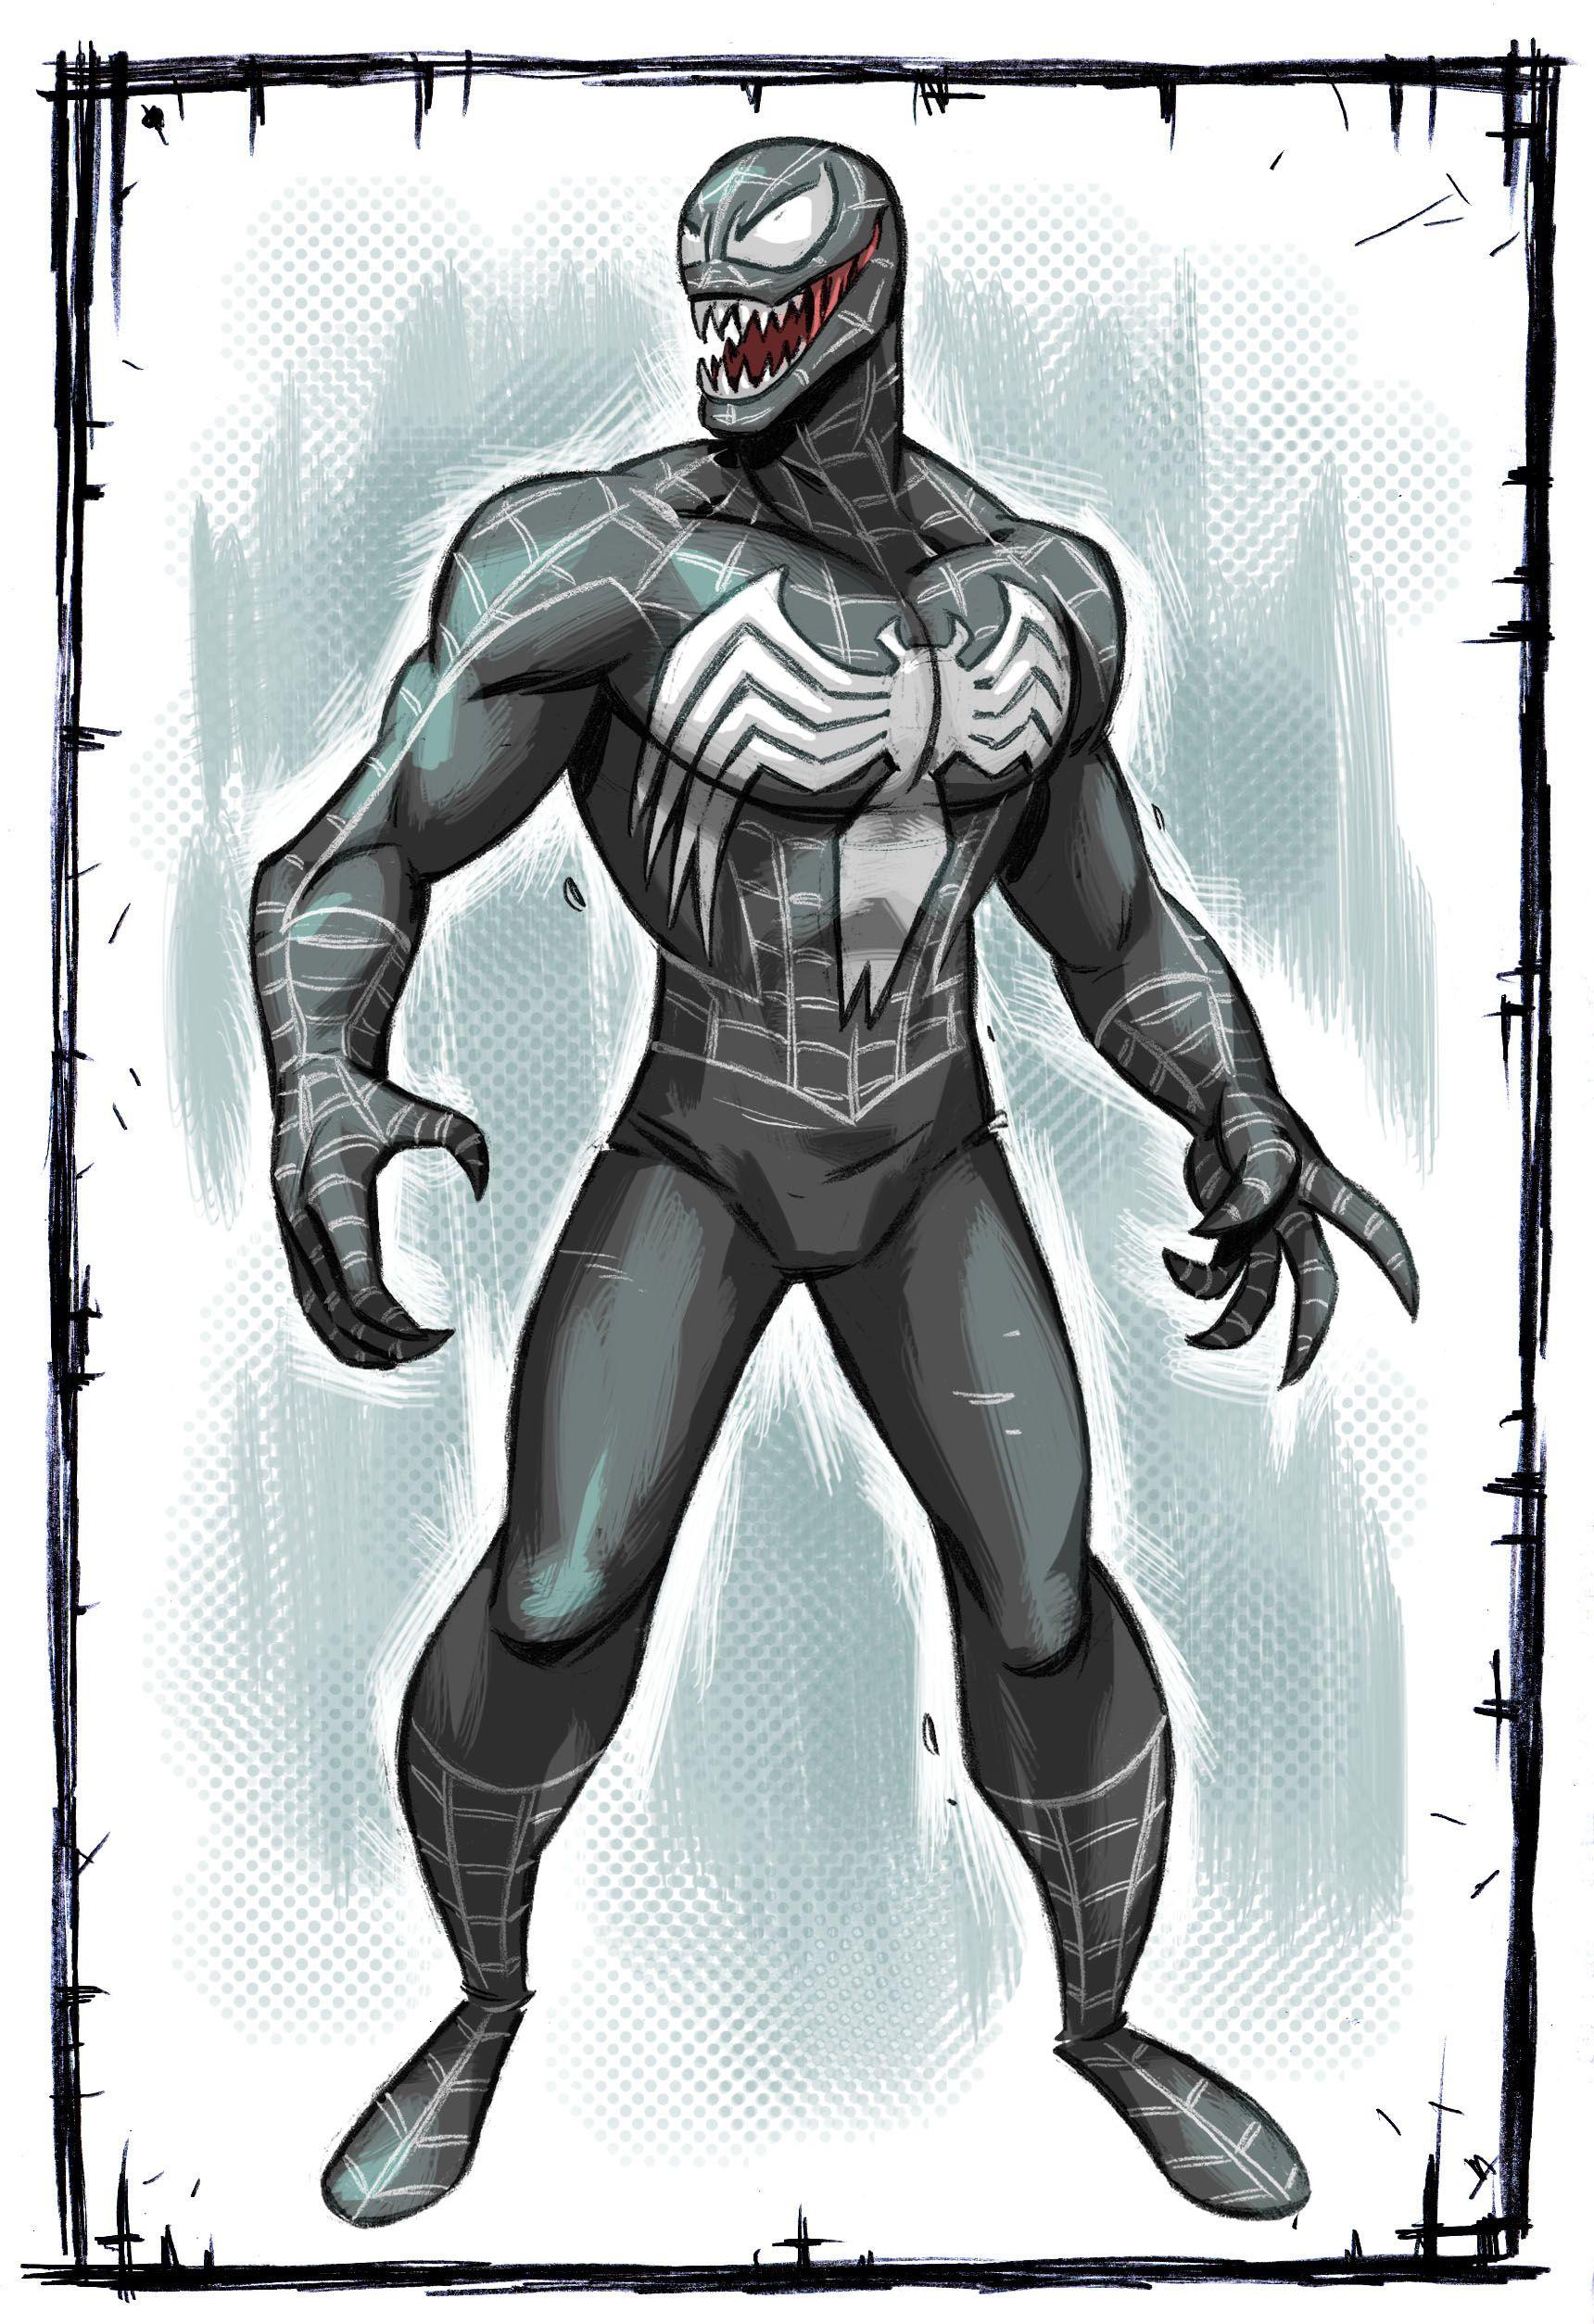 Pin by Joshua Vicente on #TheAvengersInitiative   Venom